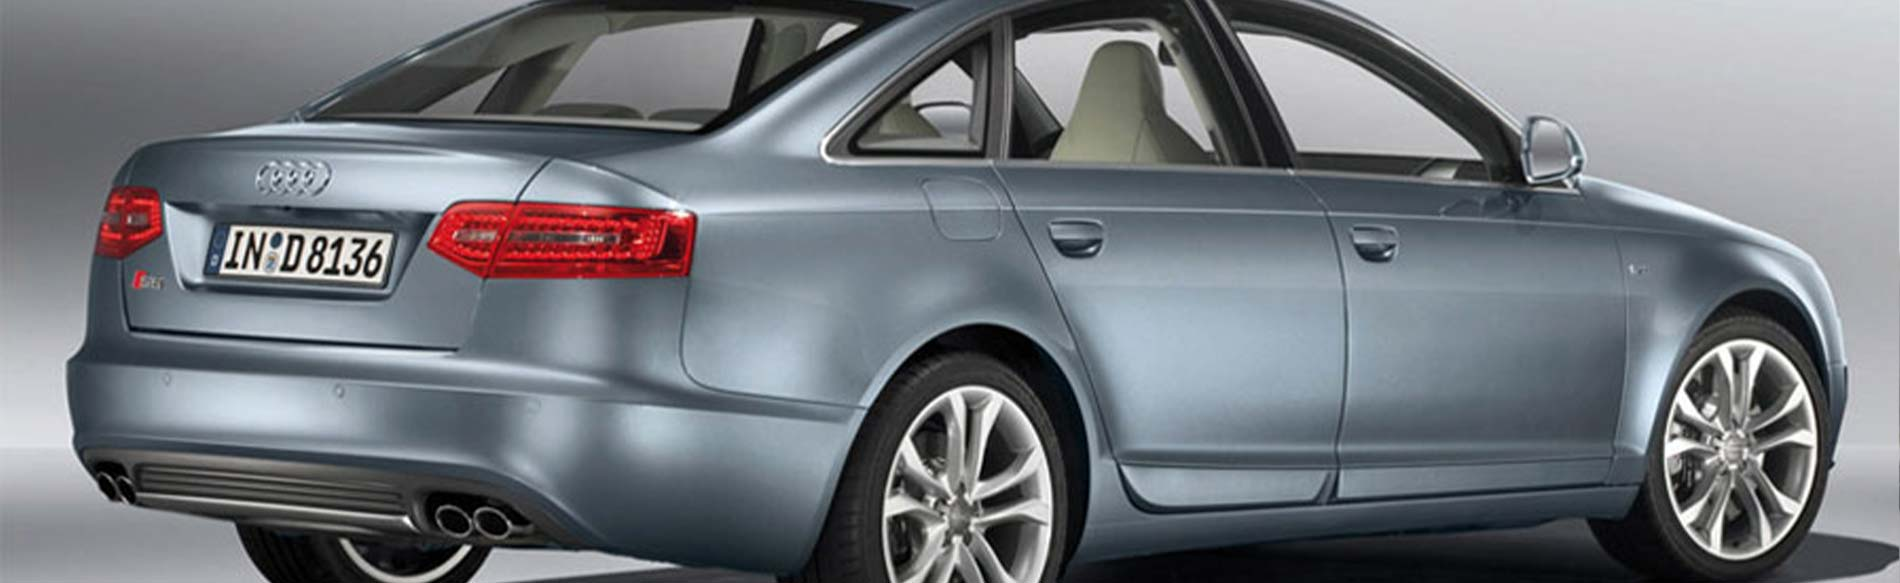 Car Dealerships In Summerville Sc >> Fanelli S Auto Sales Car Dealer In Summerville Sc